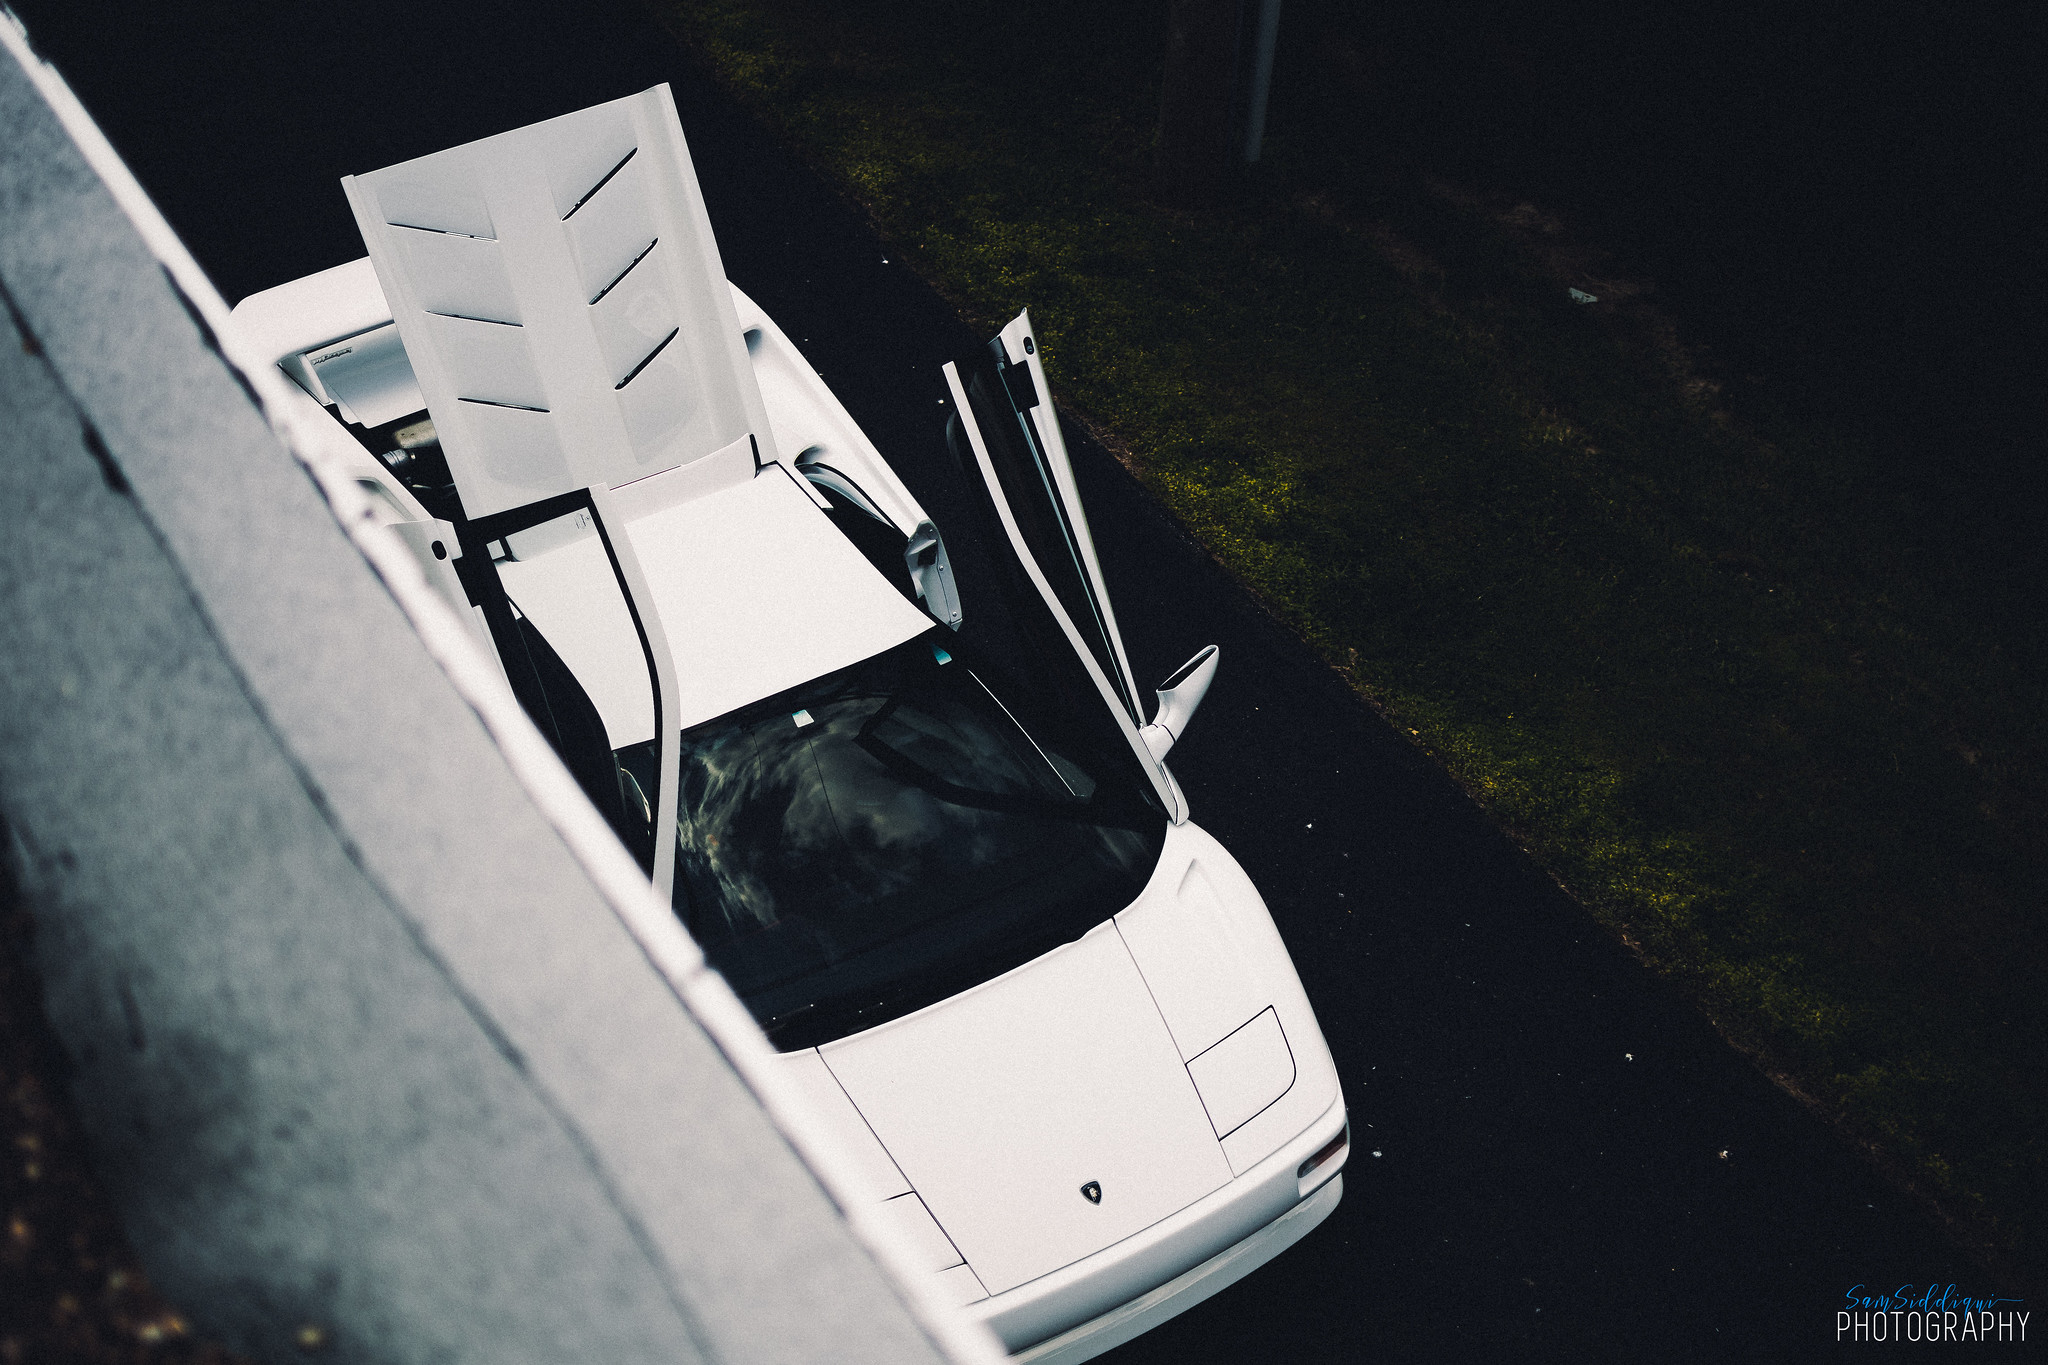 1991 White Lamborghini Diablo Open Doors and Roof